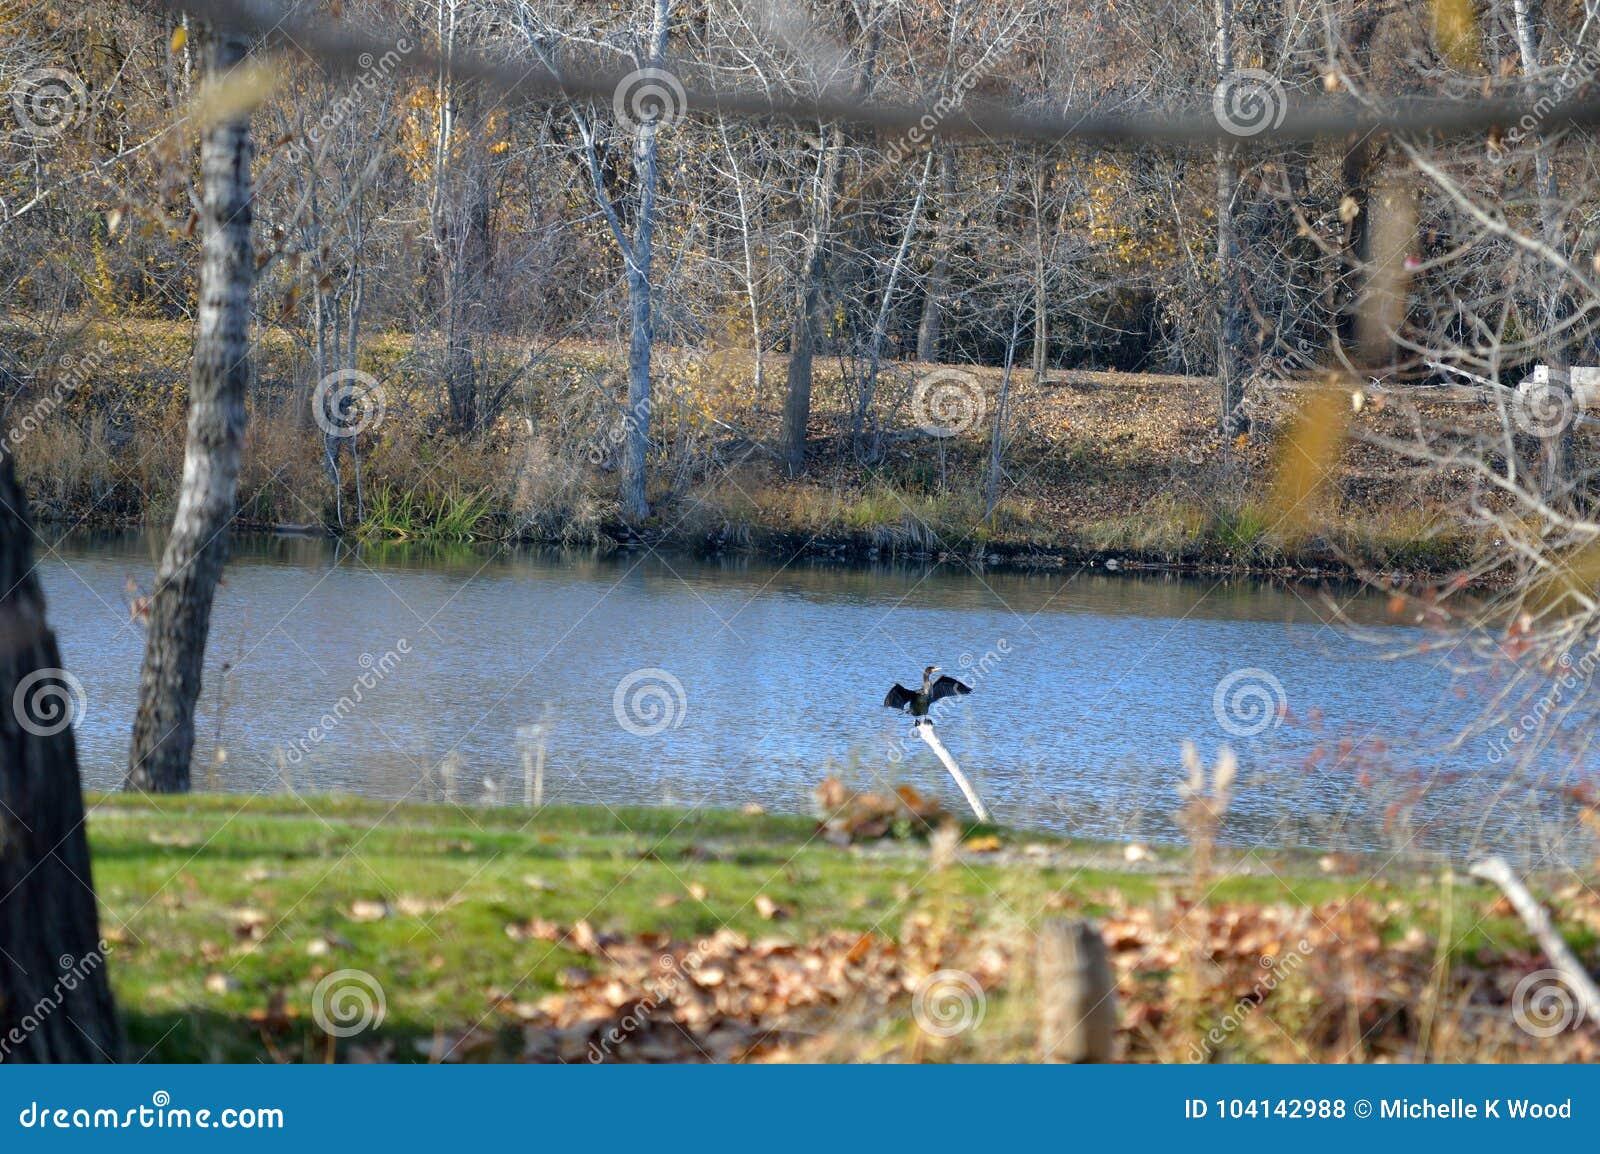 Cormorant perched on a pole